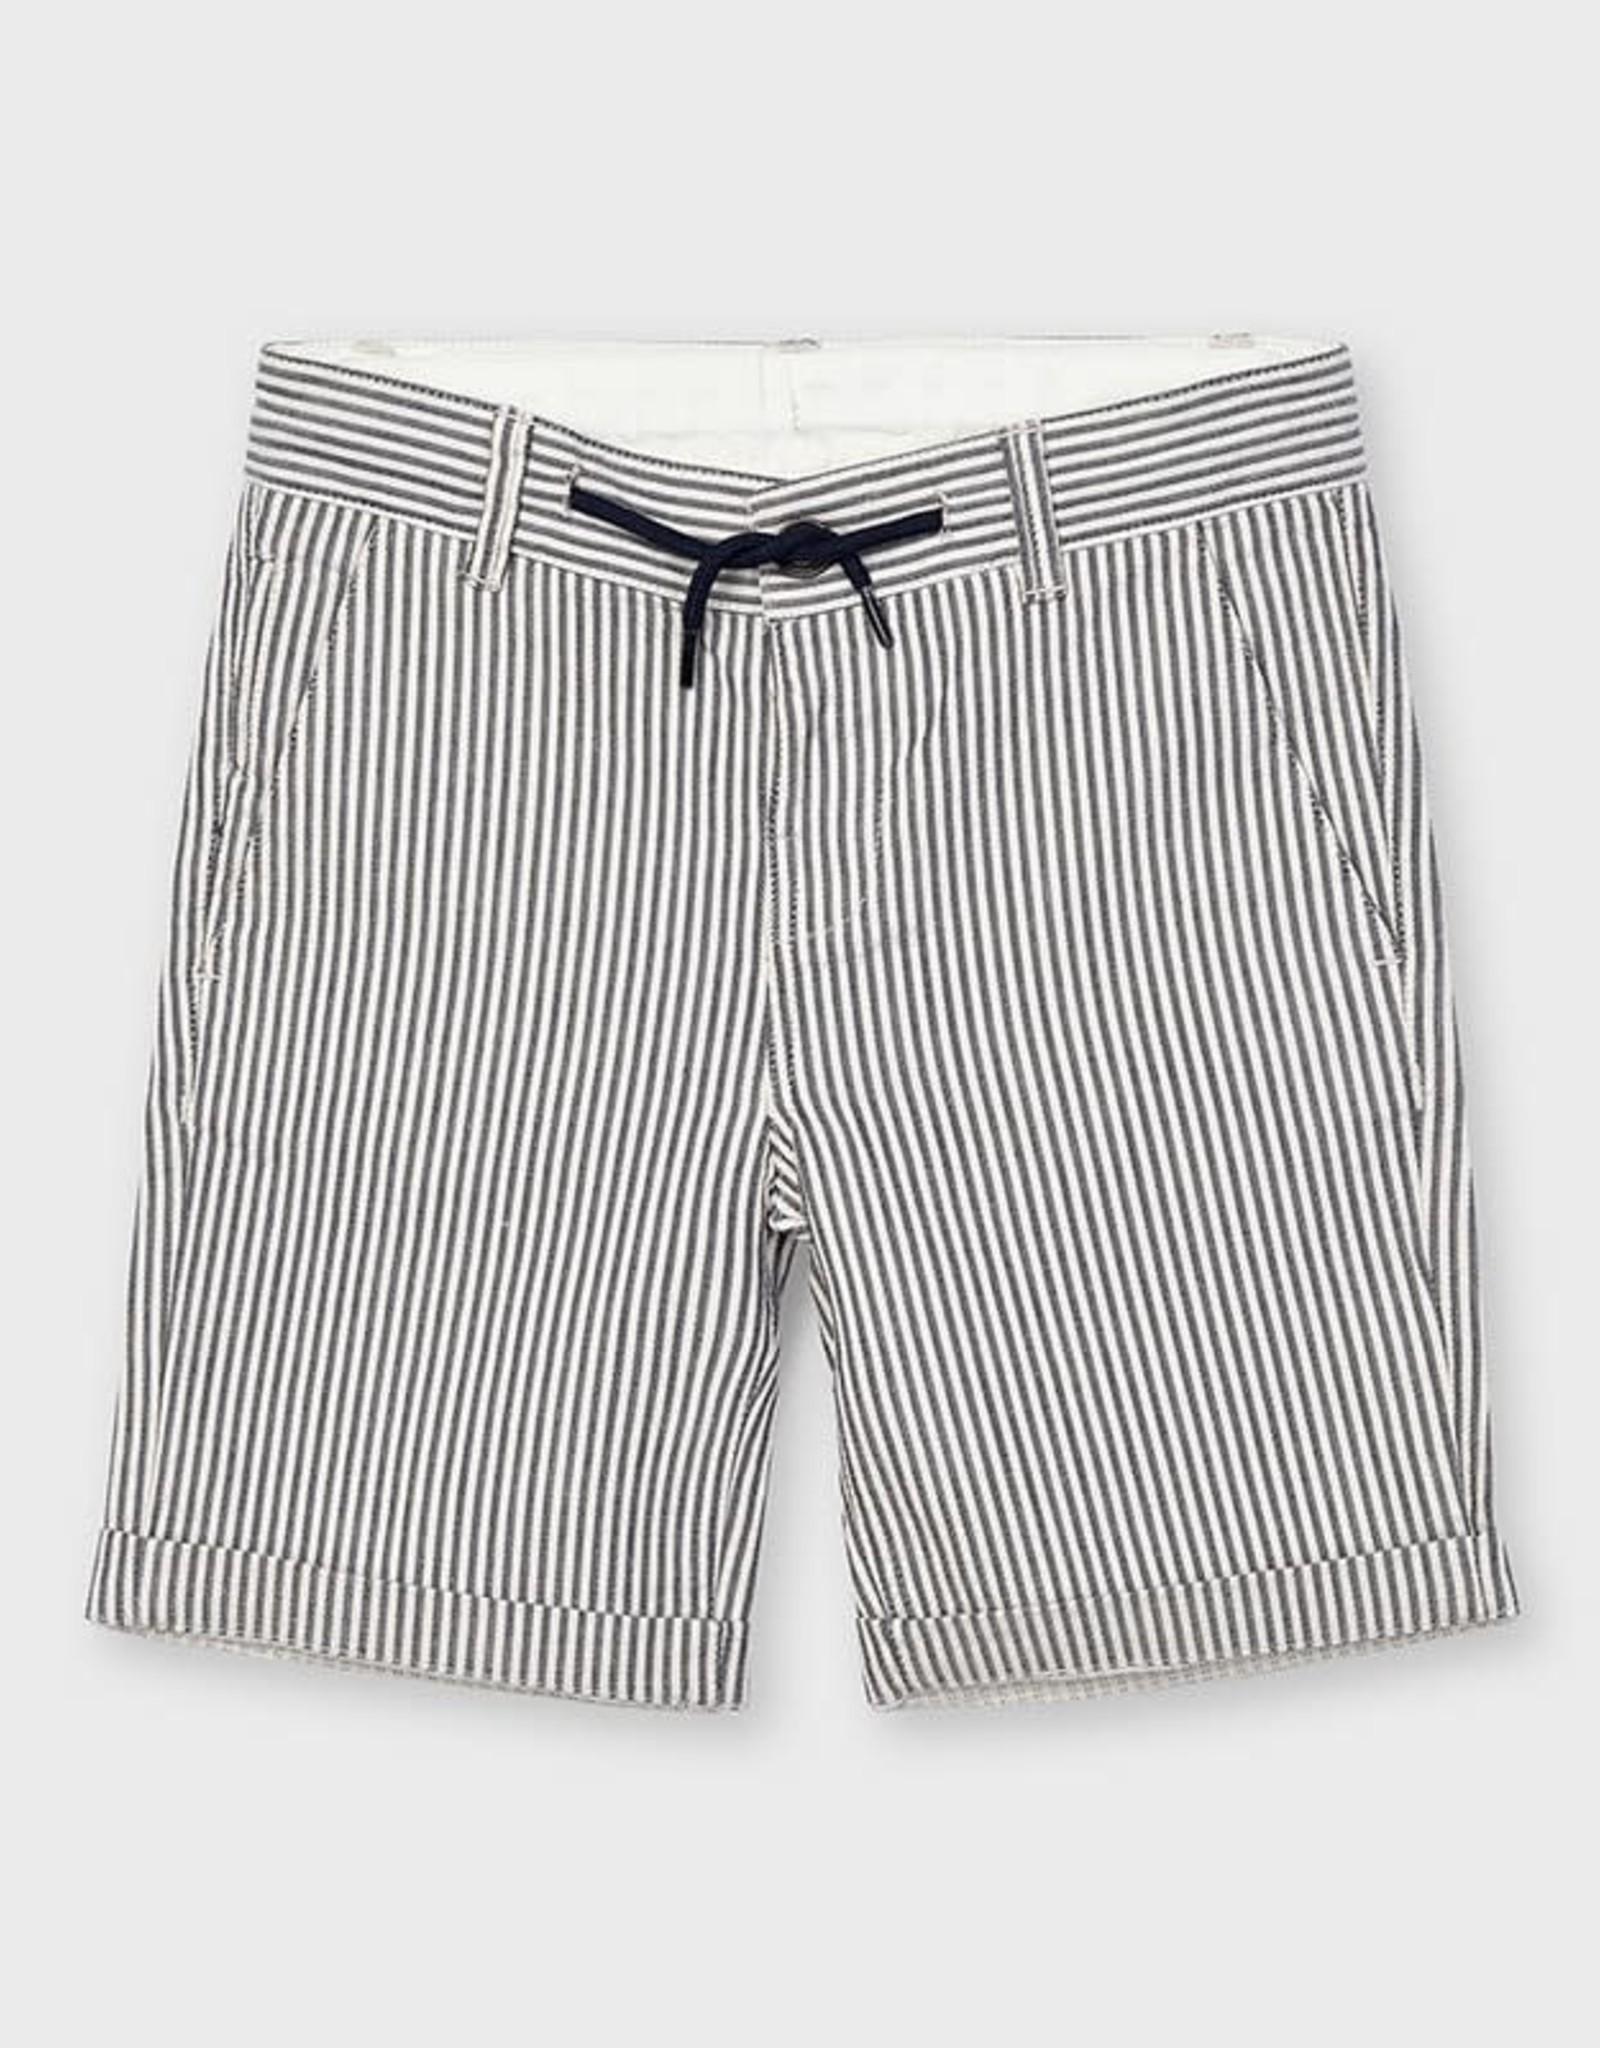 Mayoral Mayoral Boys Striped Shorts